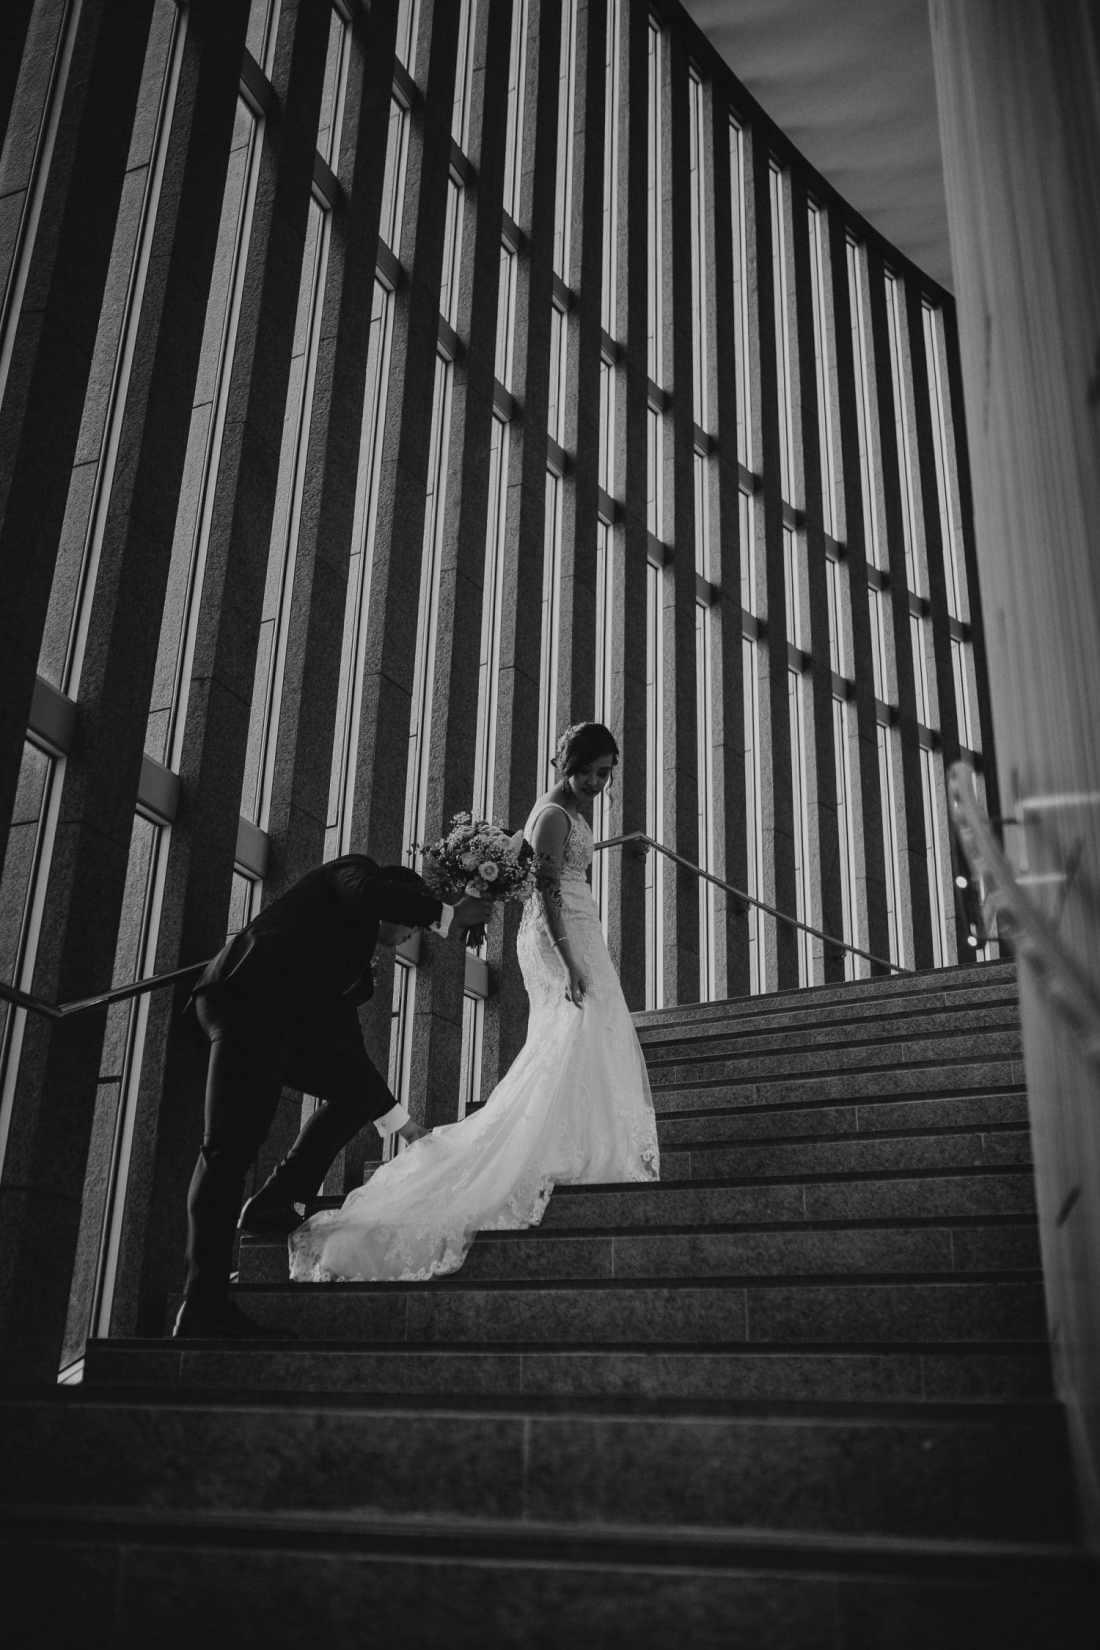 Ebony Blush Photography   Perth Wedding Photographer   Photography + Film   Sandalford Winery   Como Treasury Wedding   Perth City Wedding  Alex + Mel60